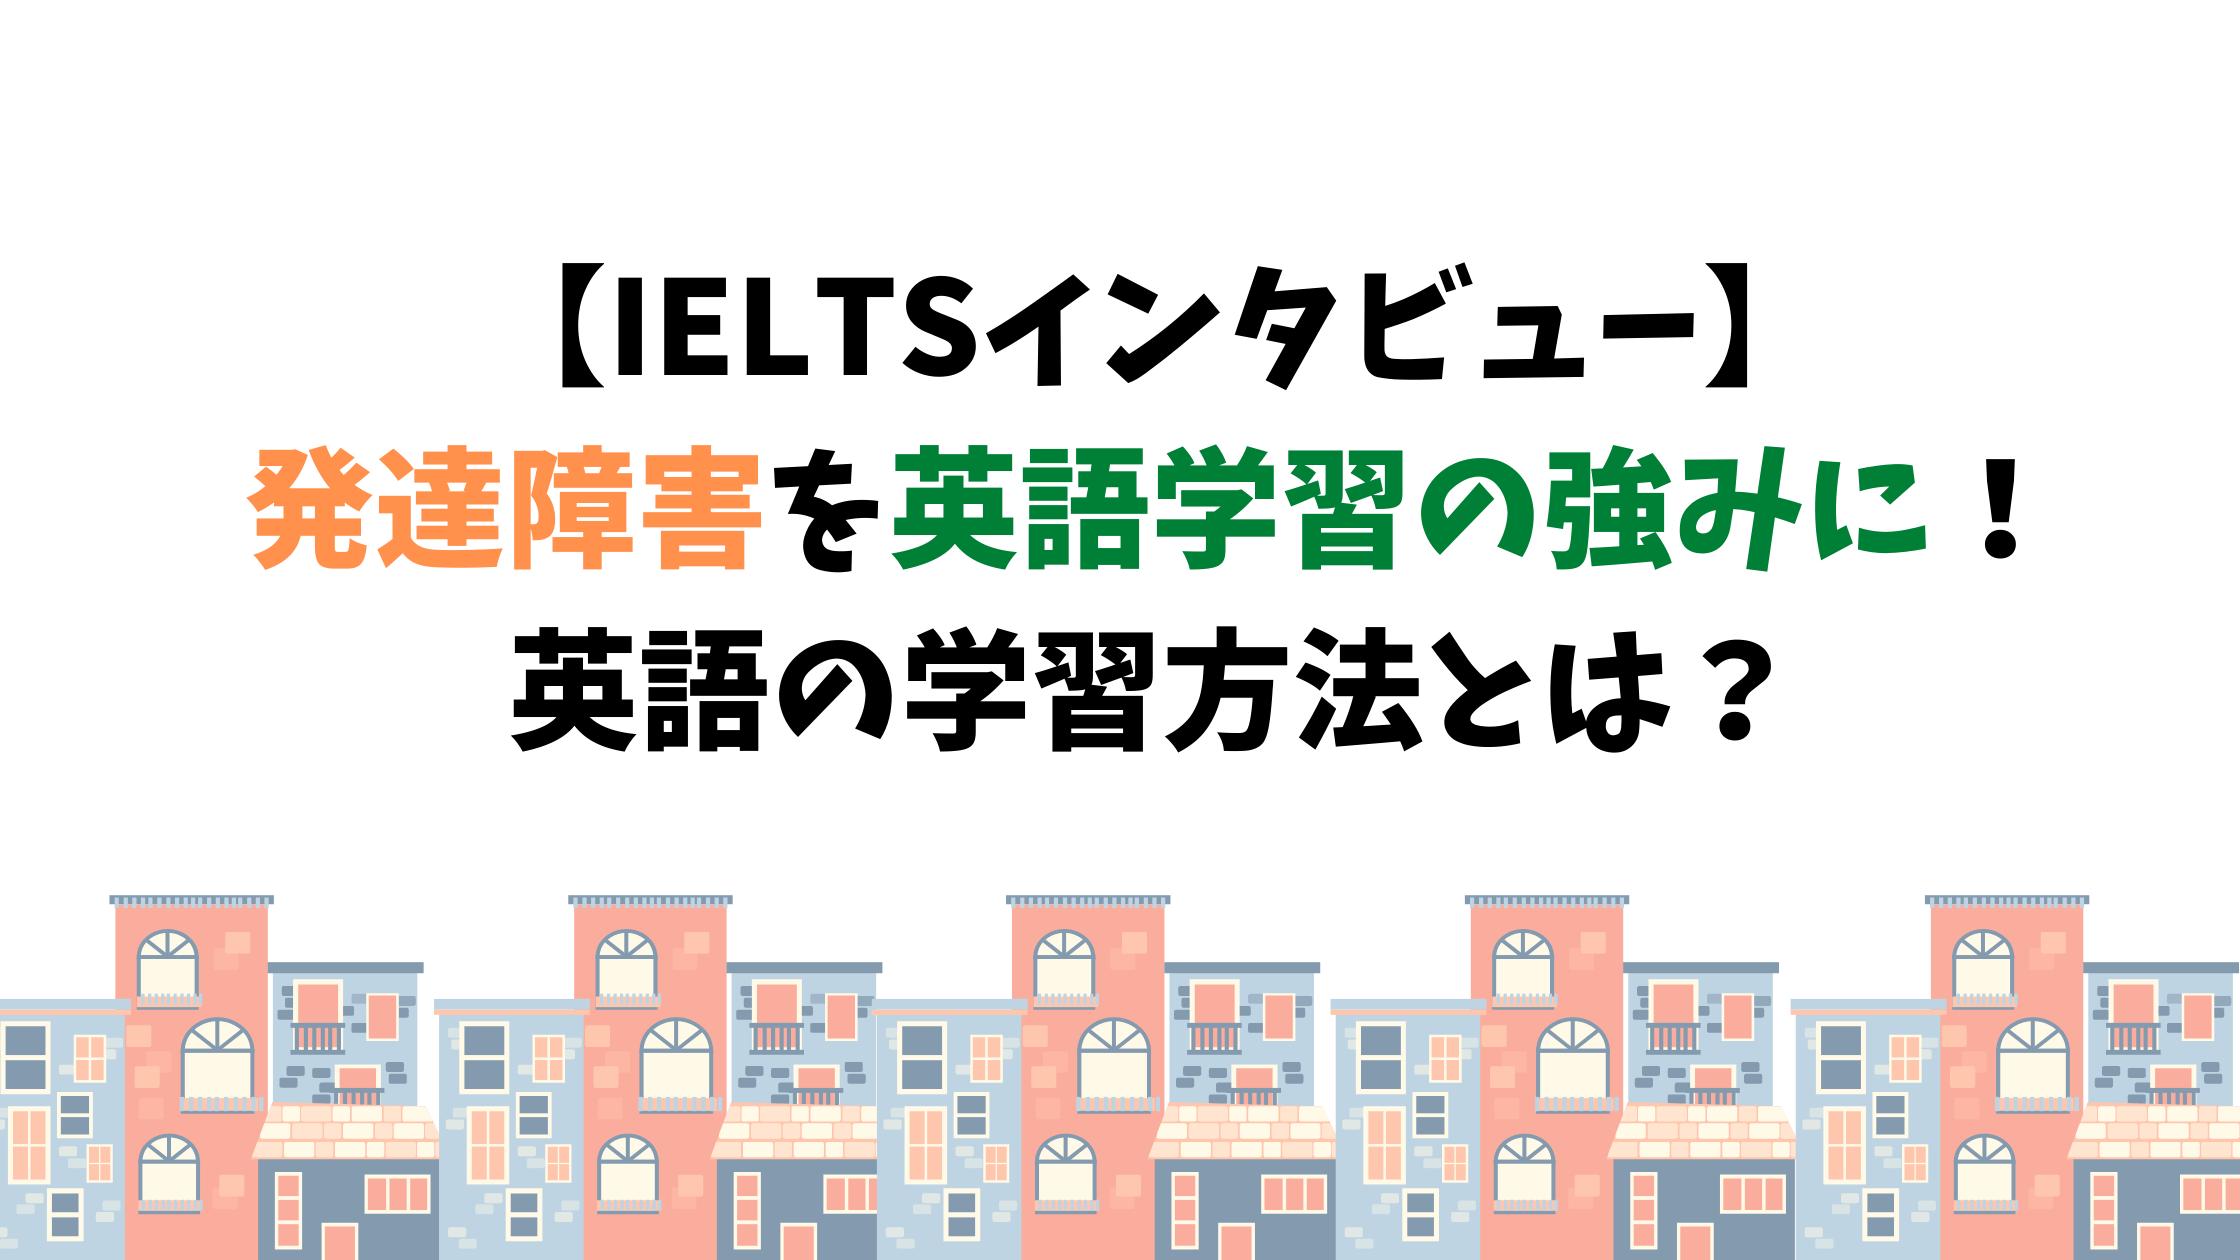 Shinichi-san IELTS